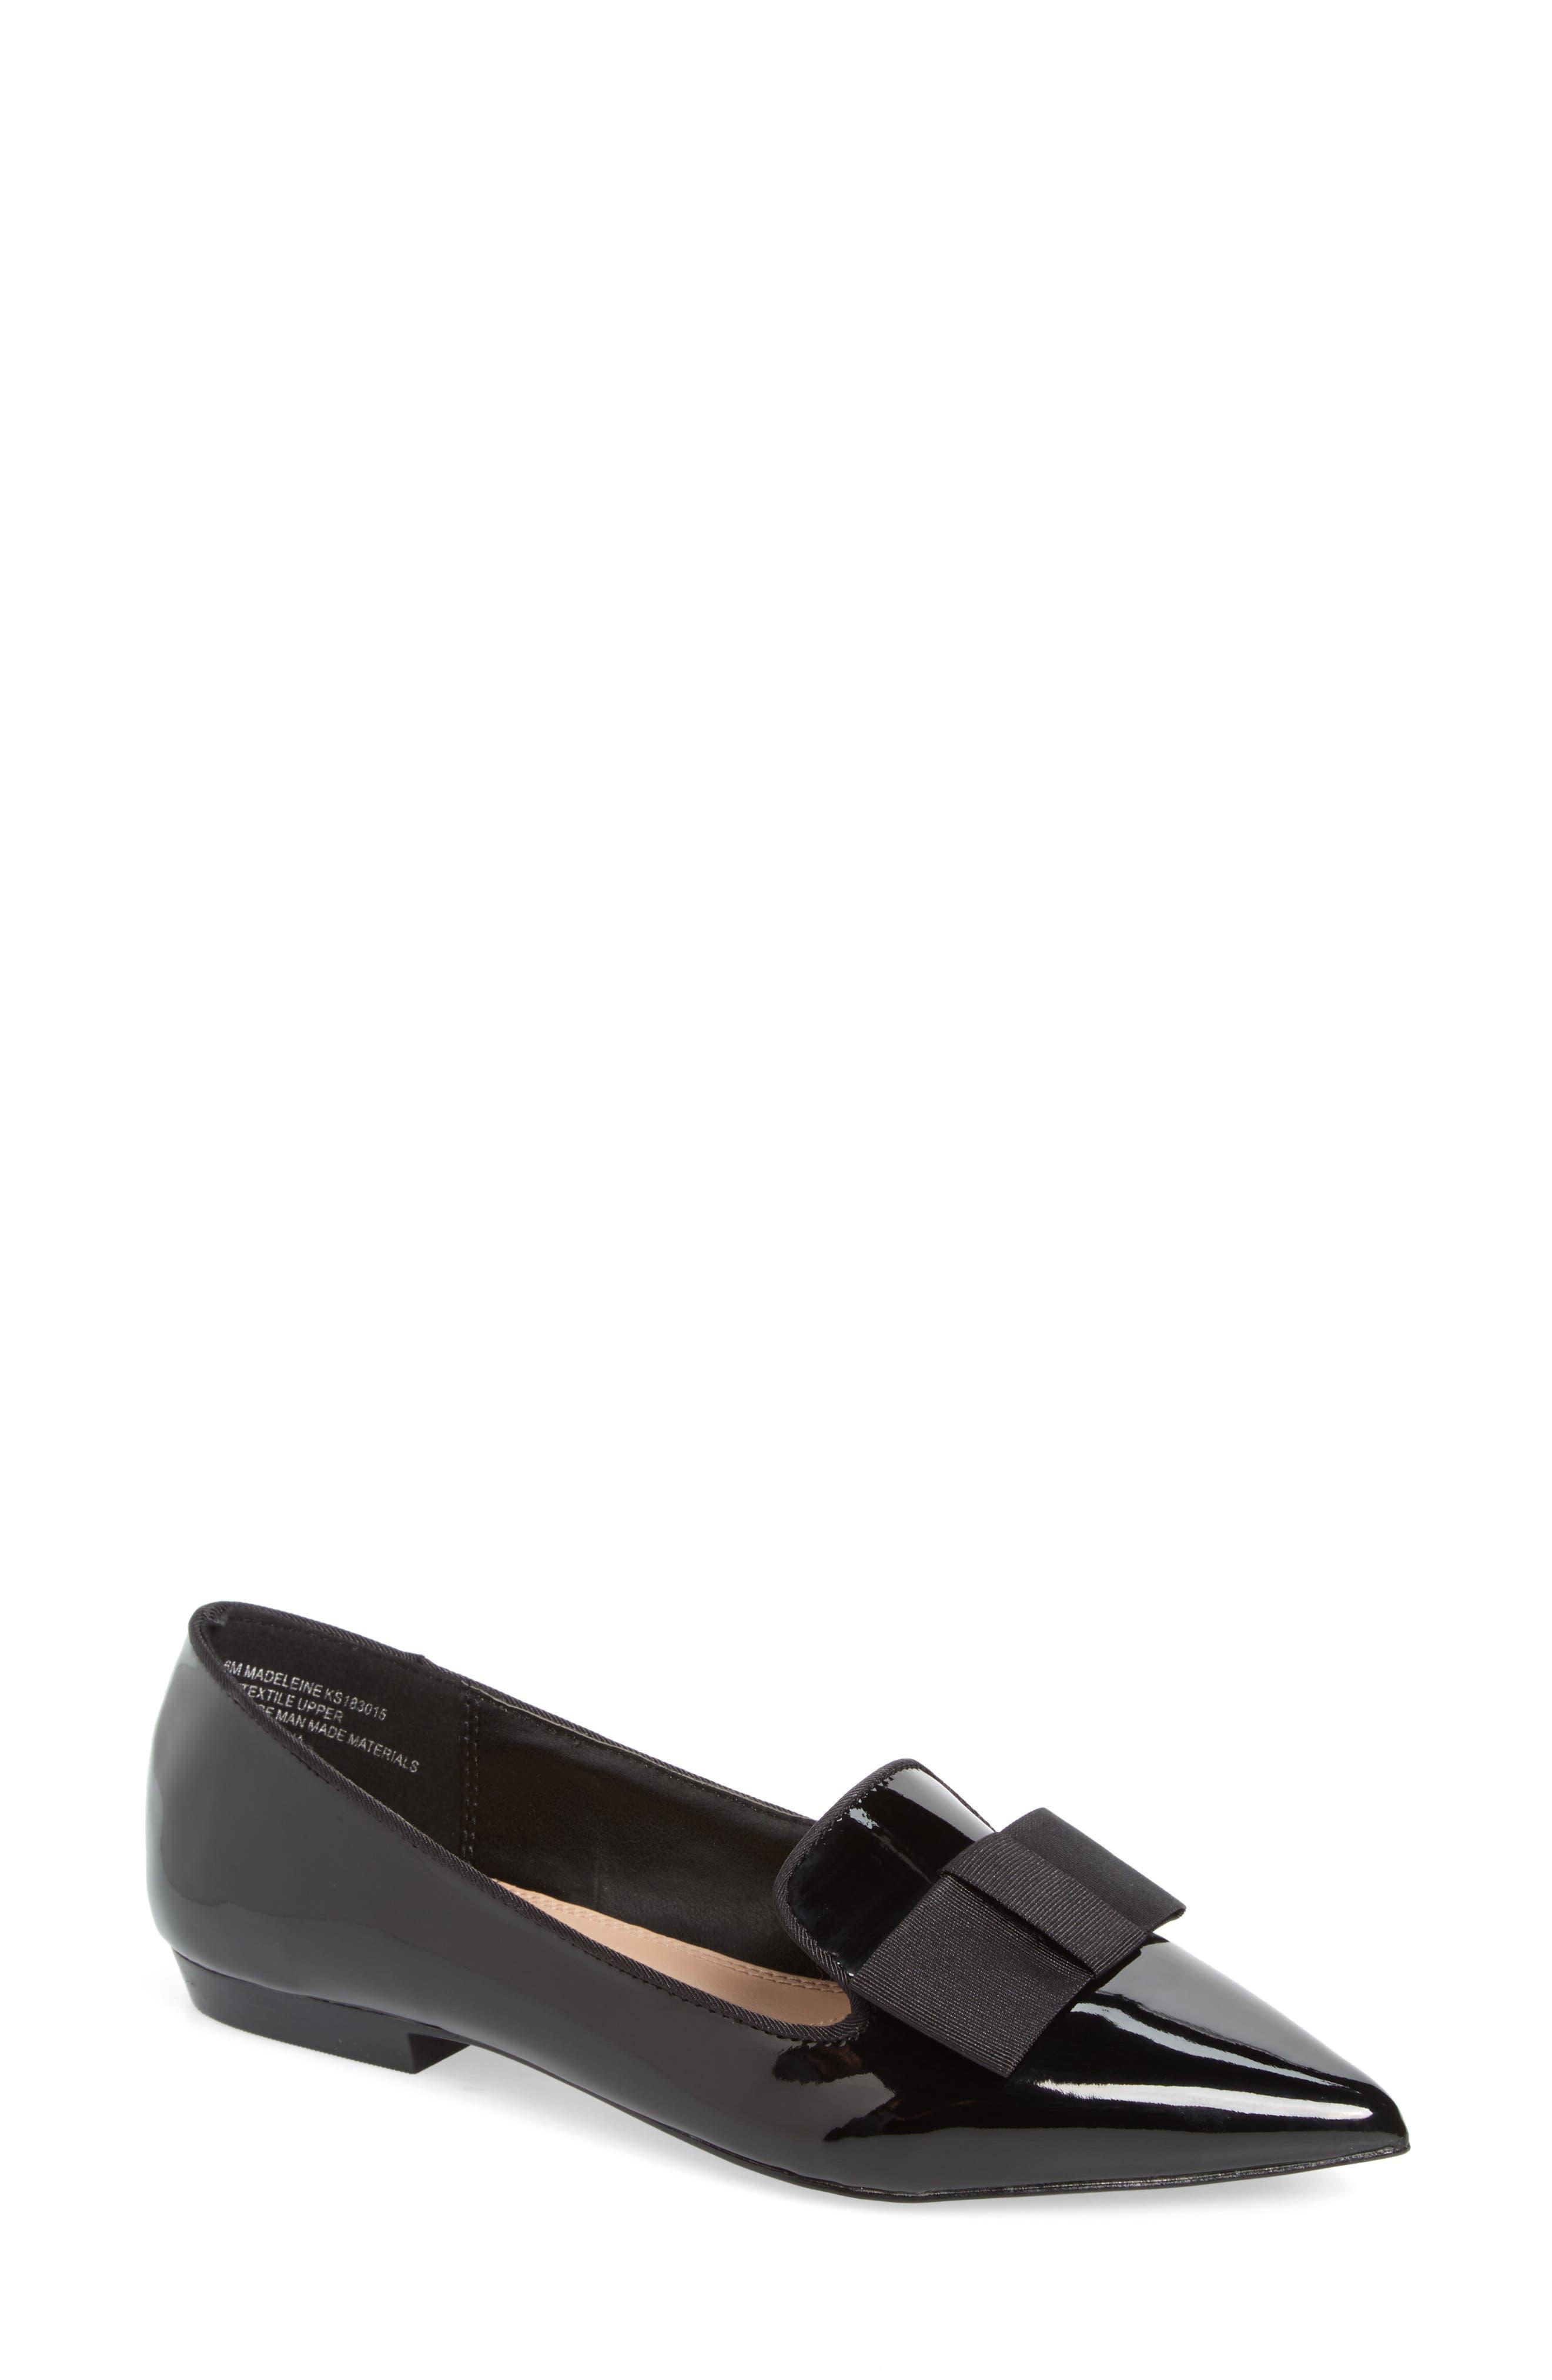 KENSIE Madeleine Pointy Toe Flat in Black Patent